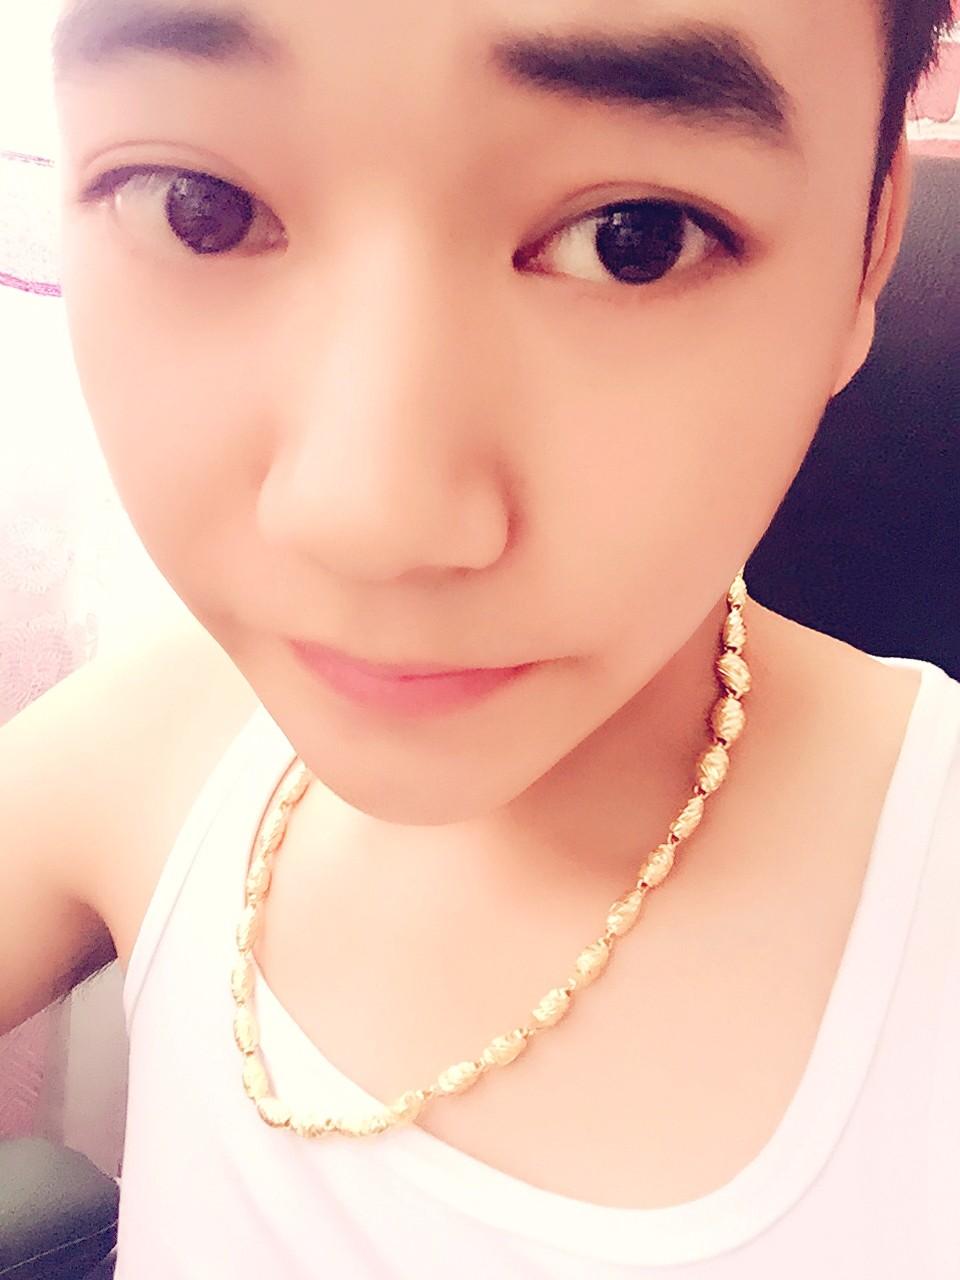 【mc阿杨-最可爱的小女孩】在线收听